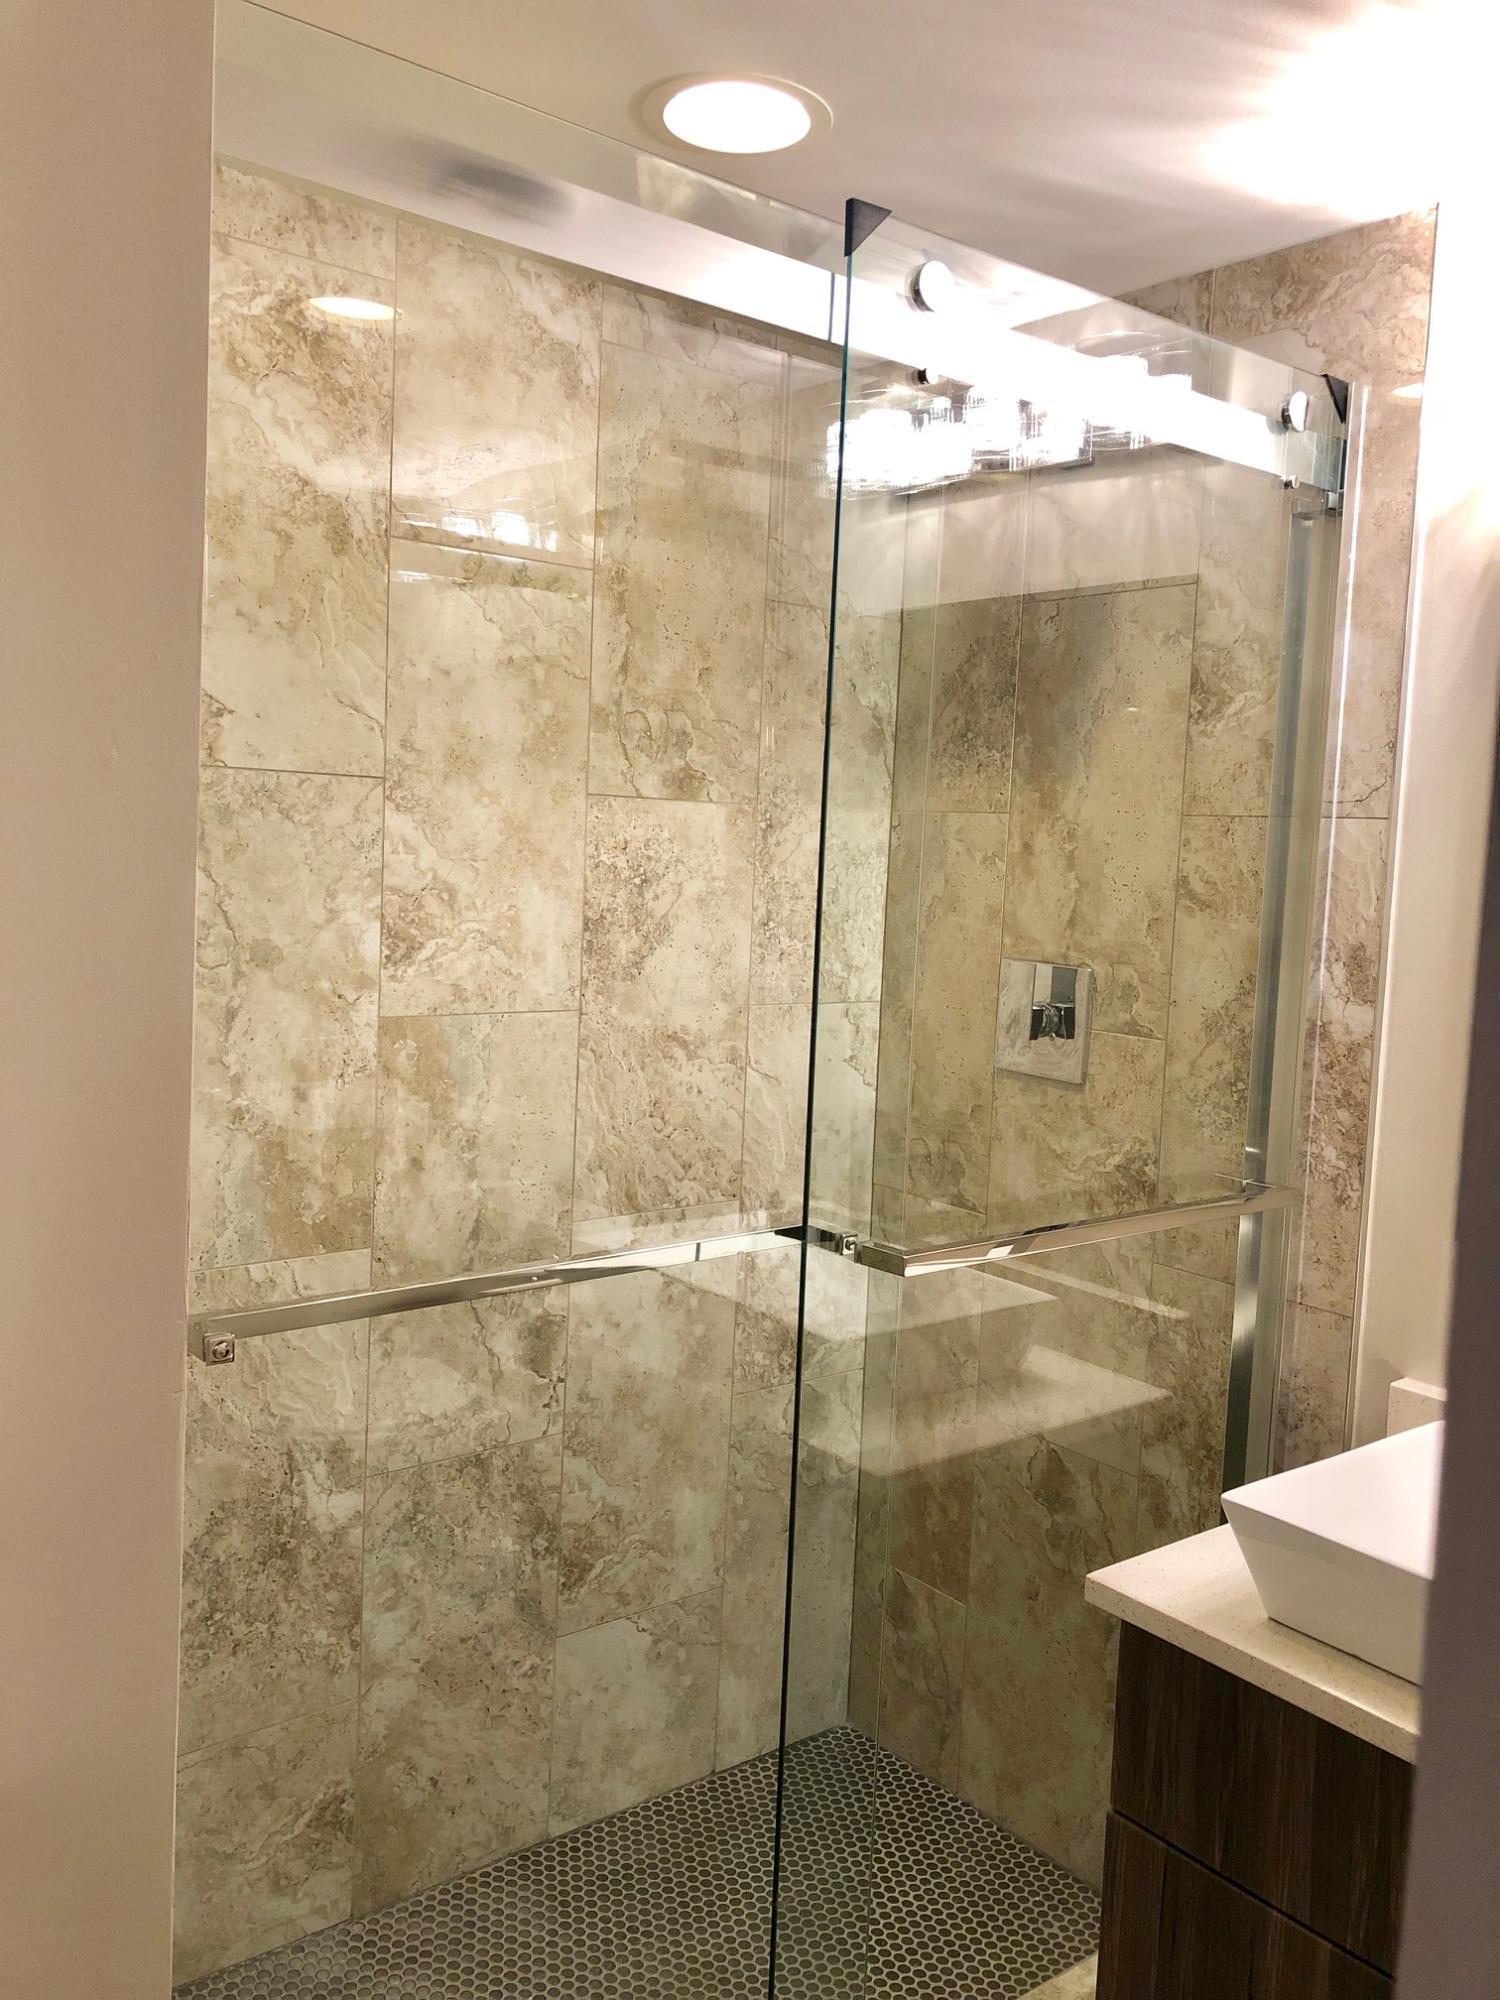 367 Auden Avenue, Columbus, Ohio 43215, 2 Bedrooms Bedrooms, ,2 BathroomsBathrooms,Residential,For Sale,Auden,219033843